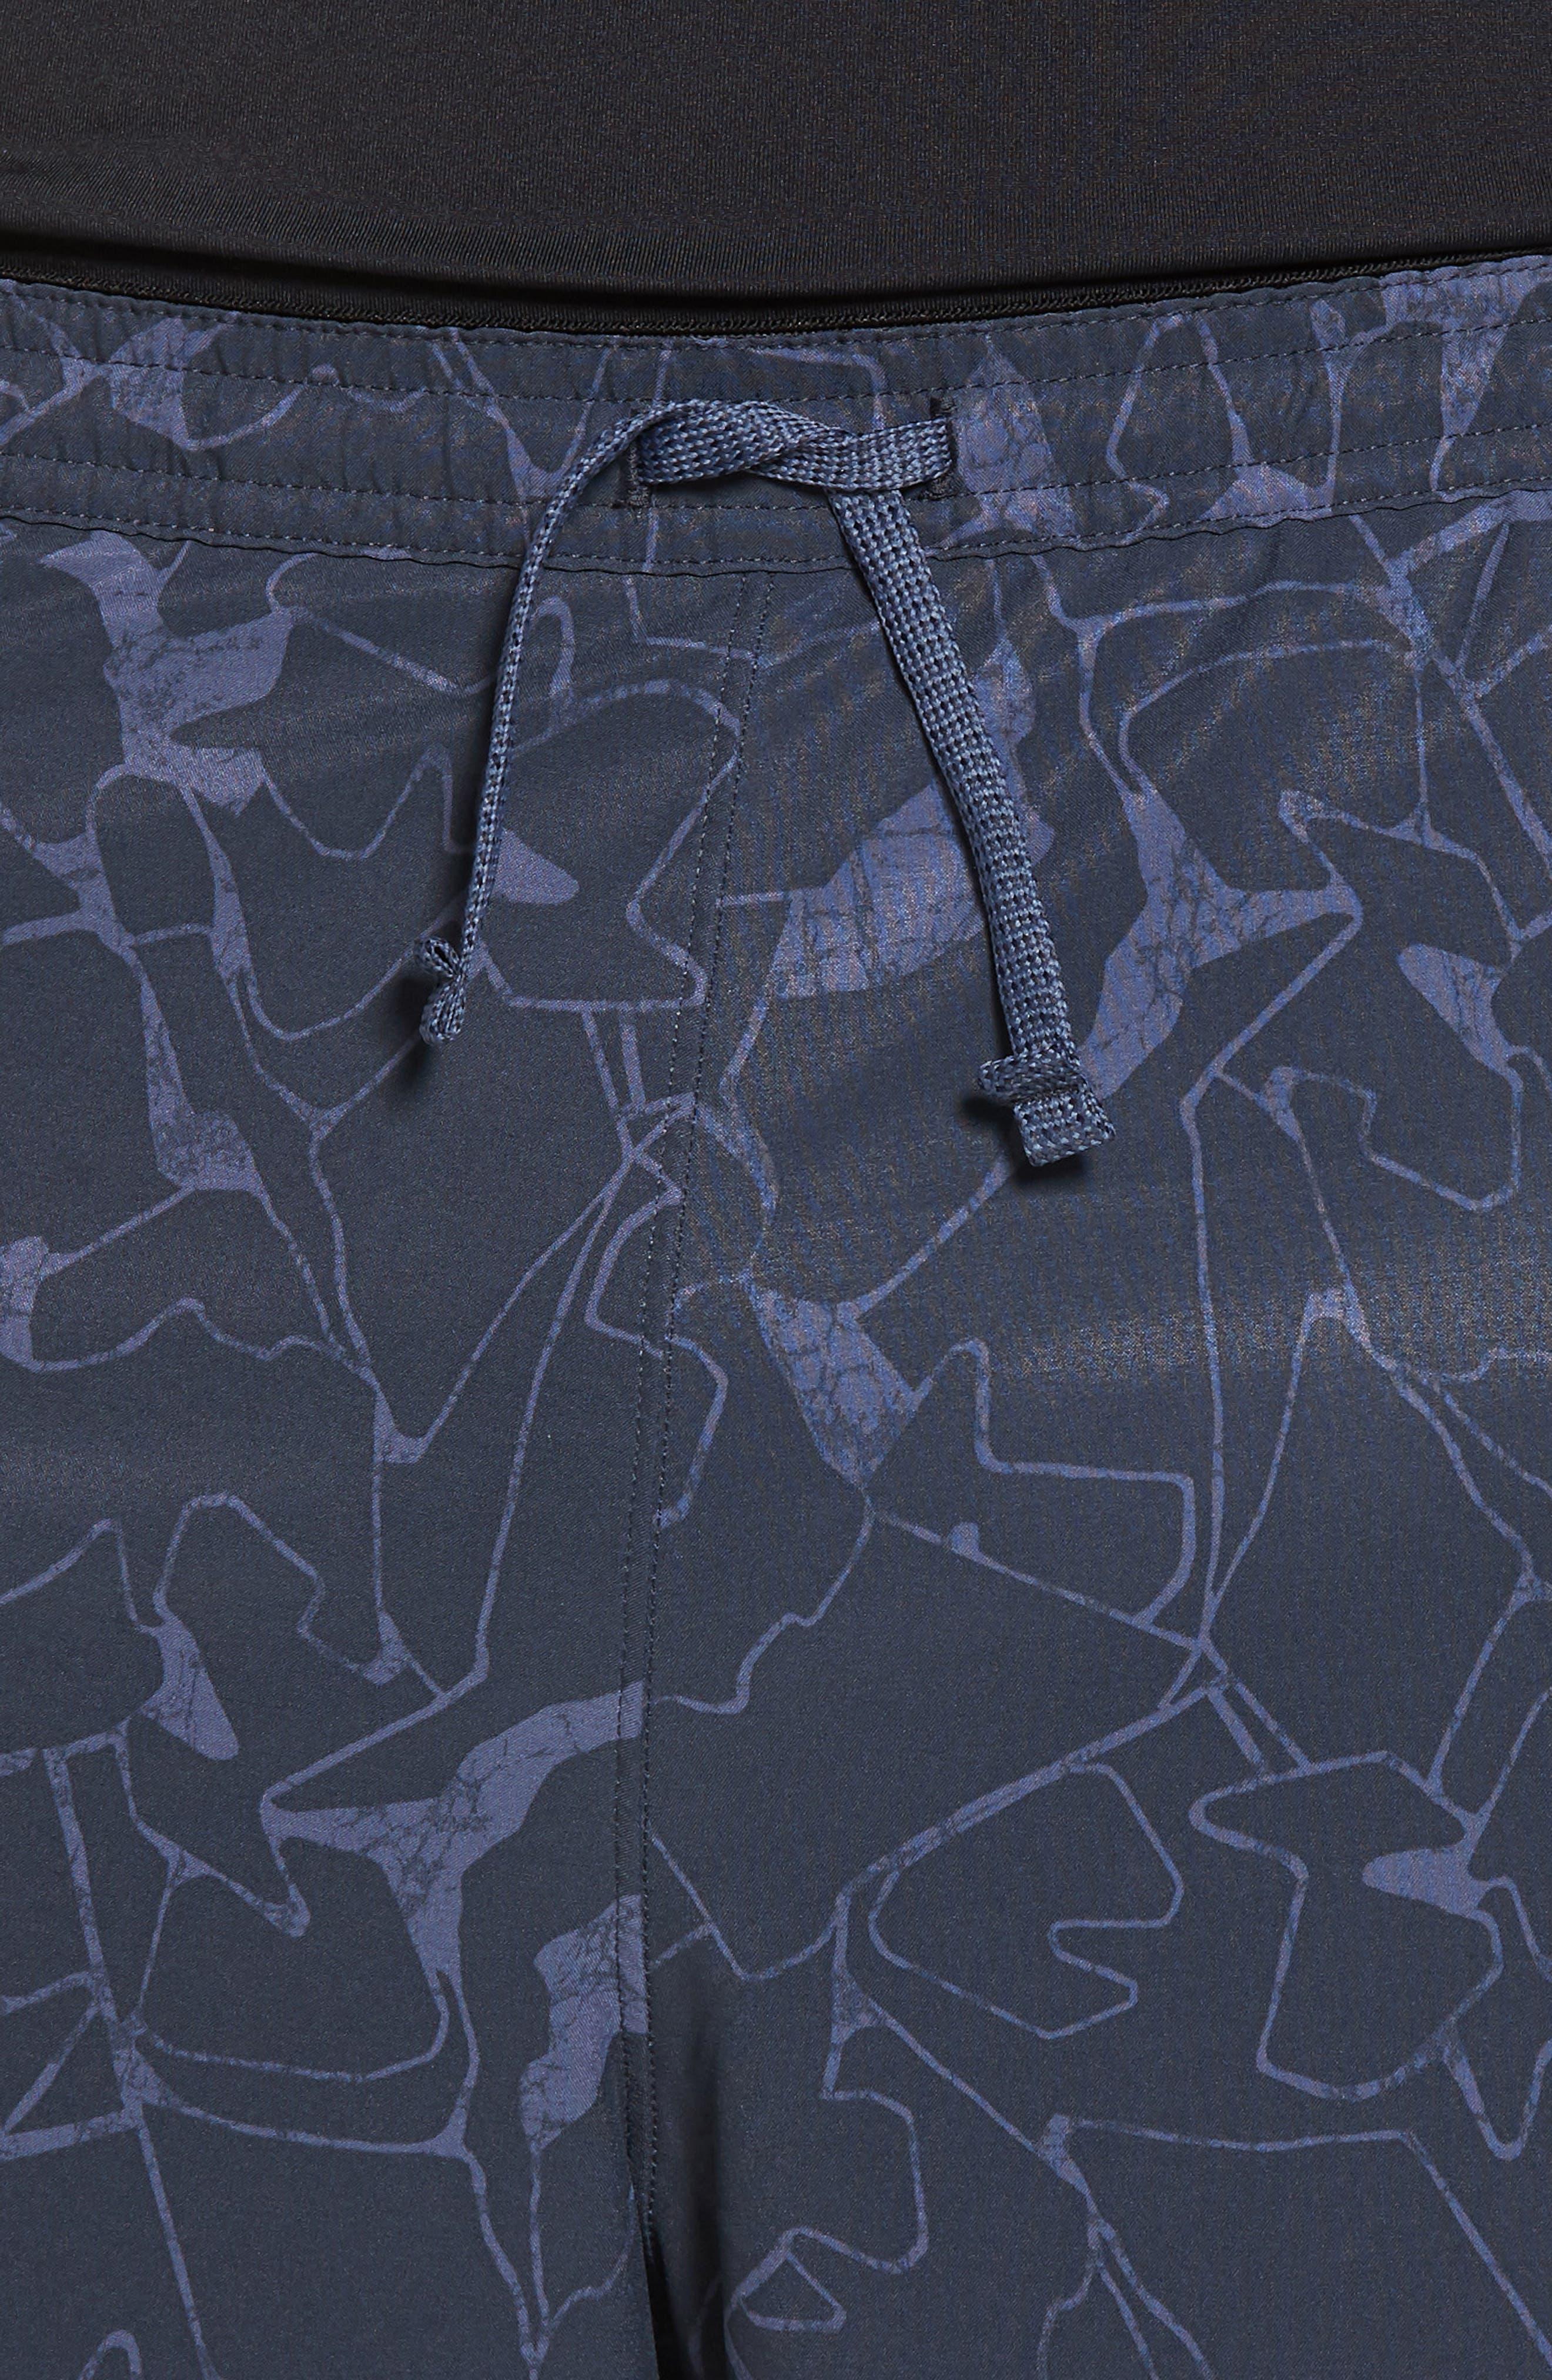 Nine Trails Hiking Shorts,                             Alternate thumbnail 4, color,                             Rock Jigsaw/ Smolder Blue